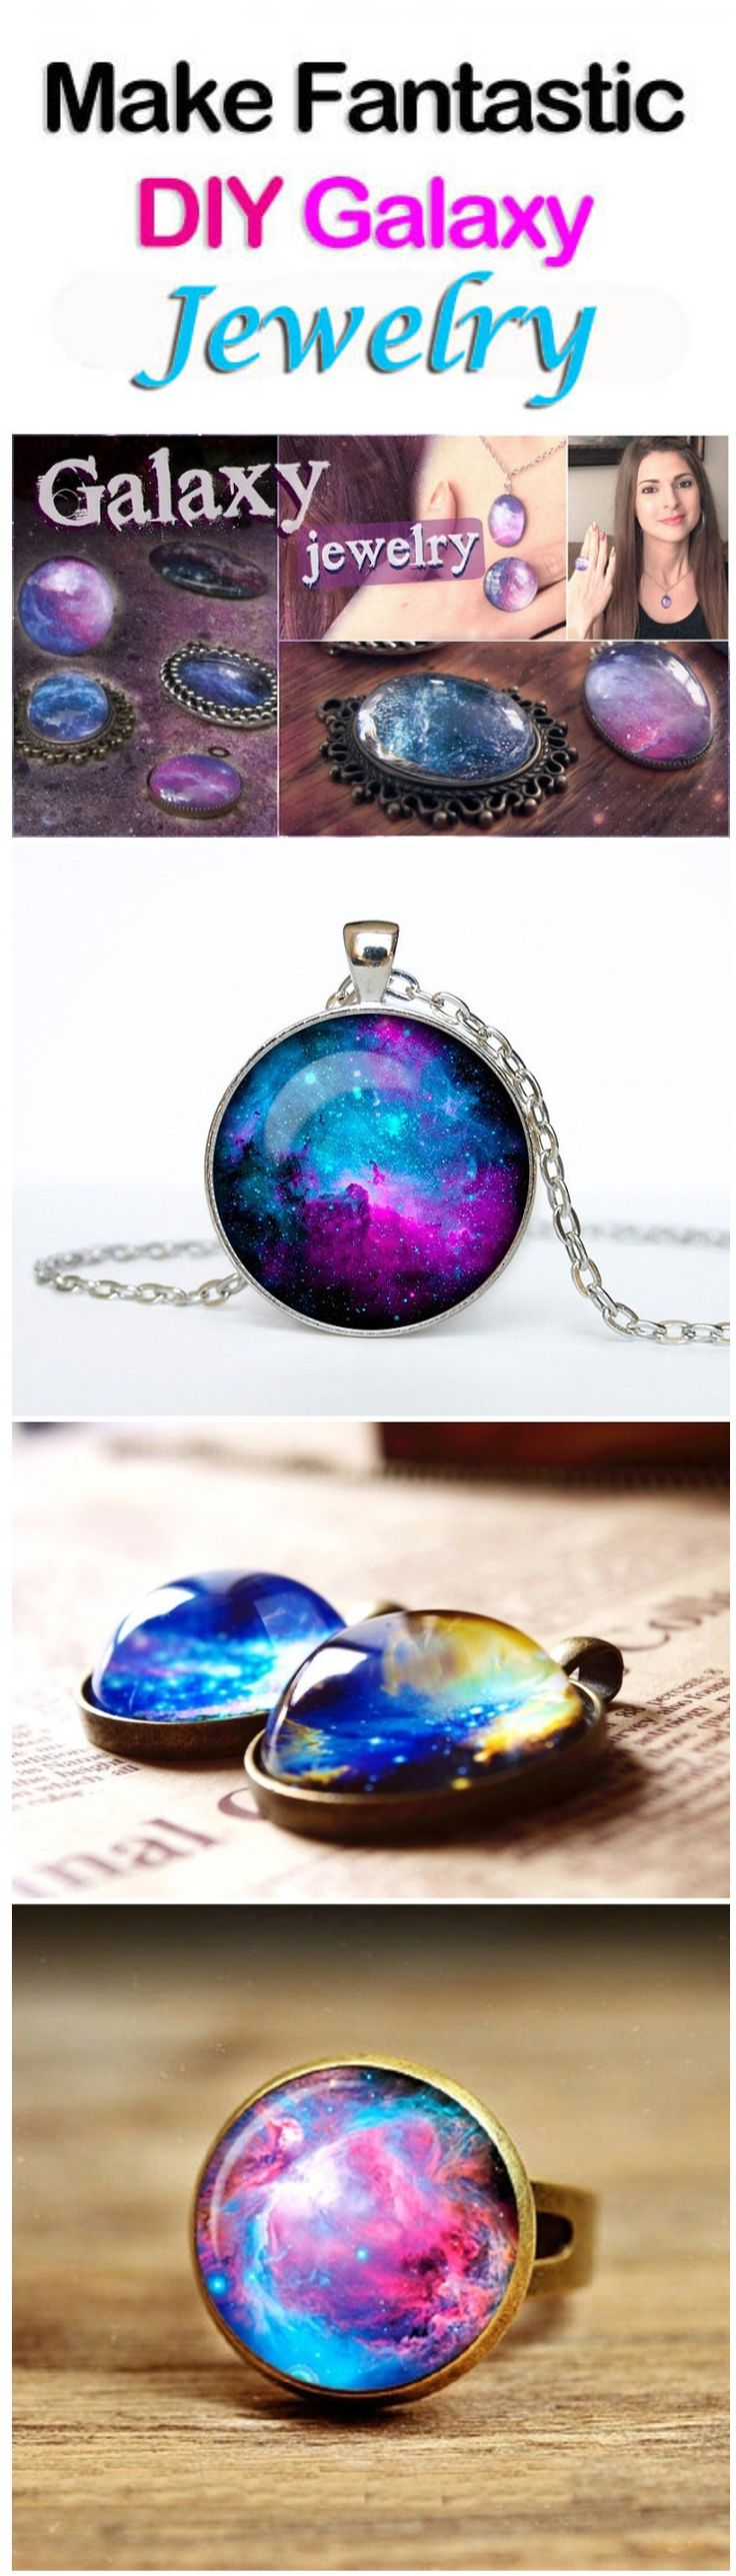 Make Wonderful DIY Galaxy Jewelry